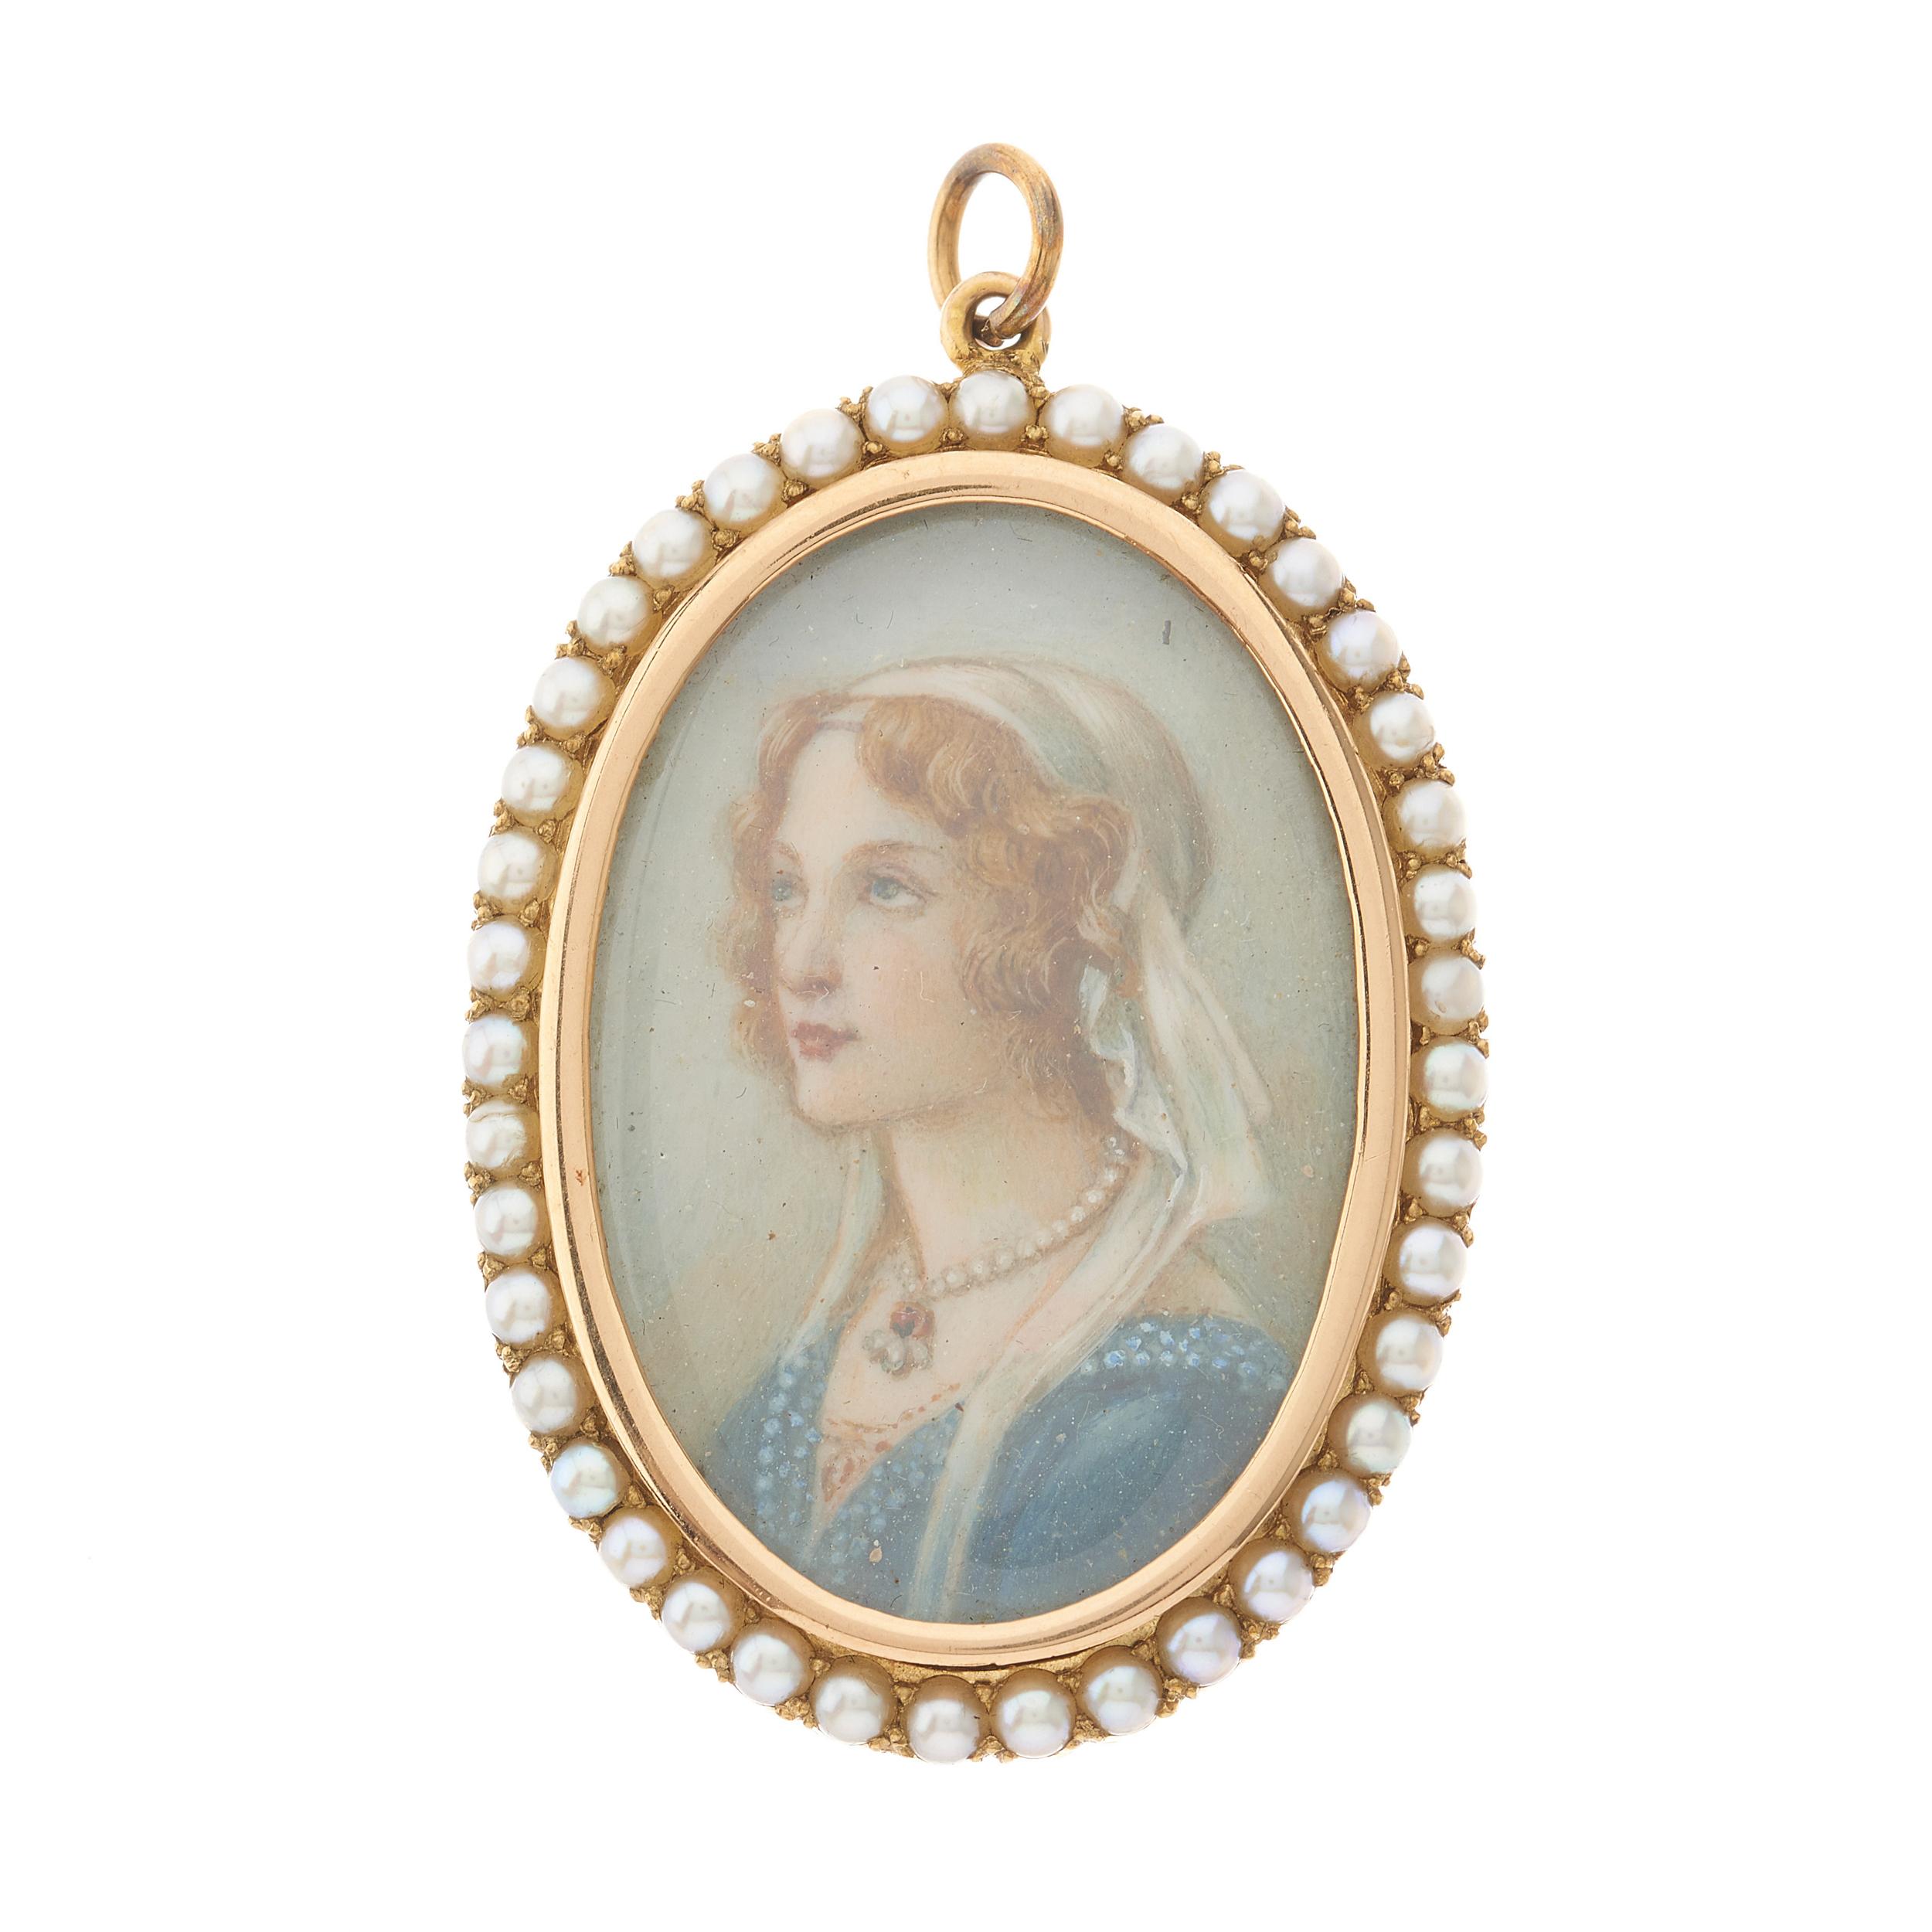 An early 20th century 15ct gold split pearl portrait pendant